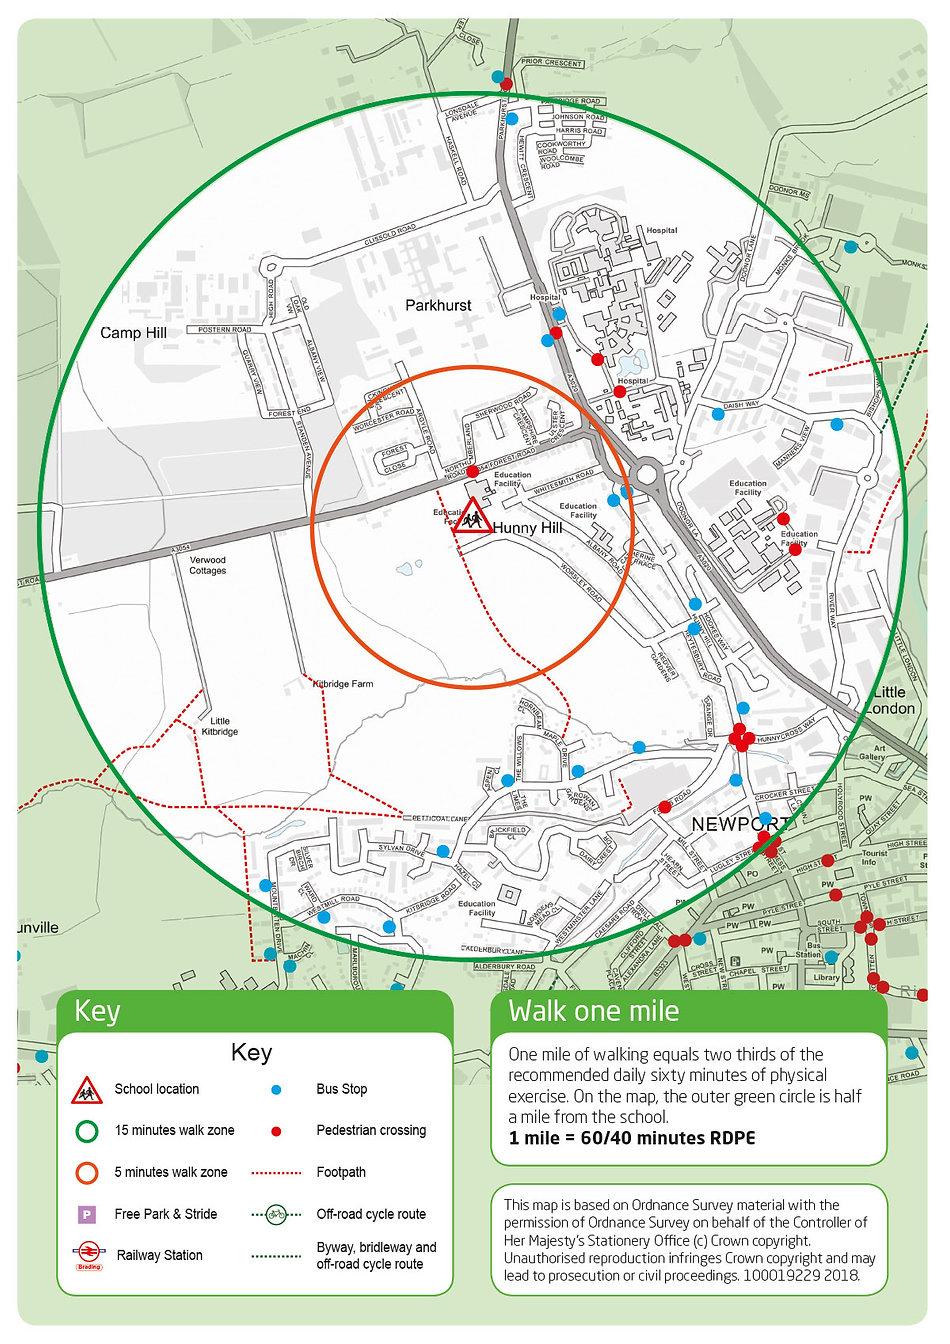 Hunnyhill-Primary-School Map.jpg